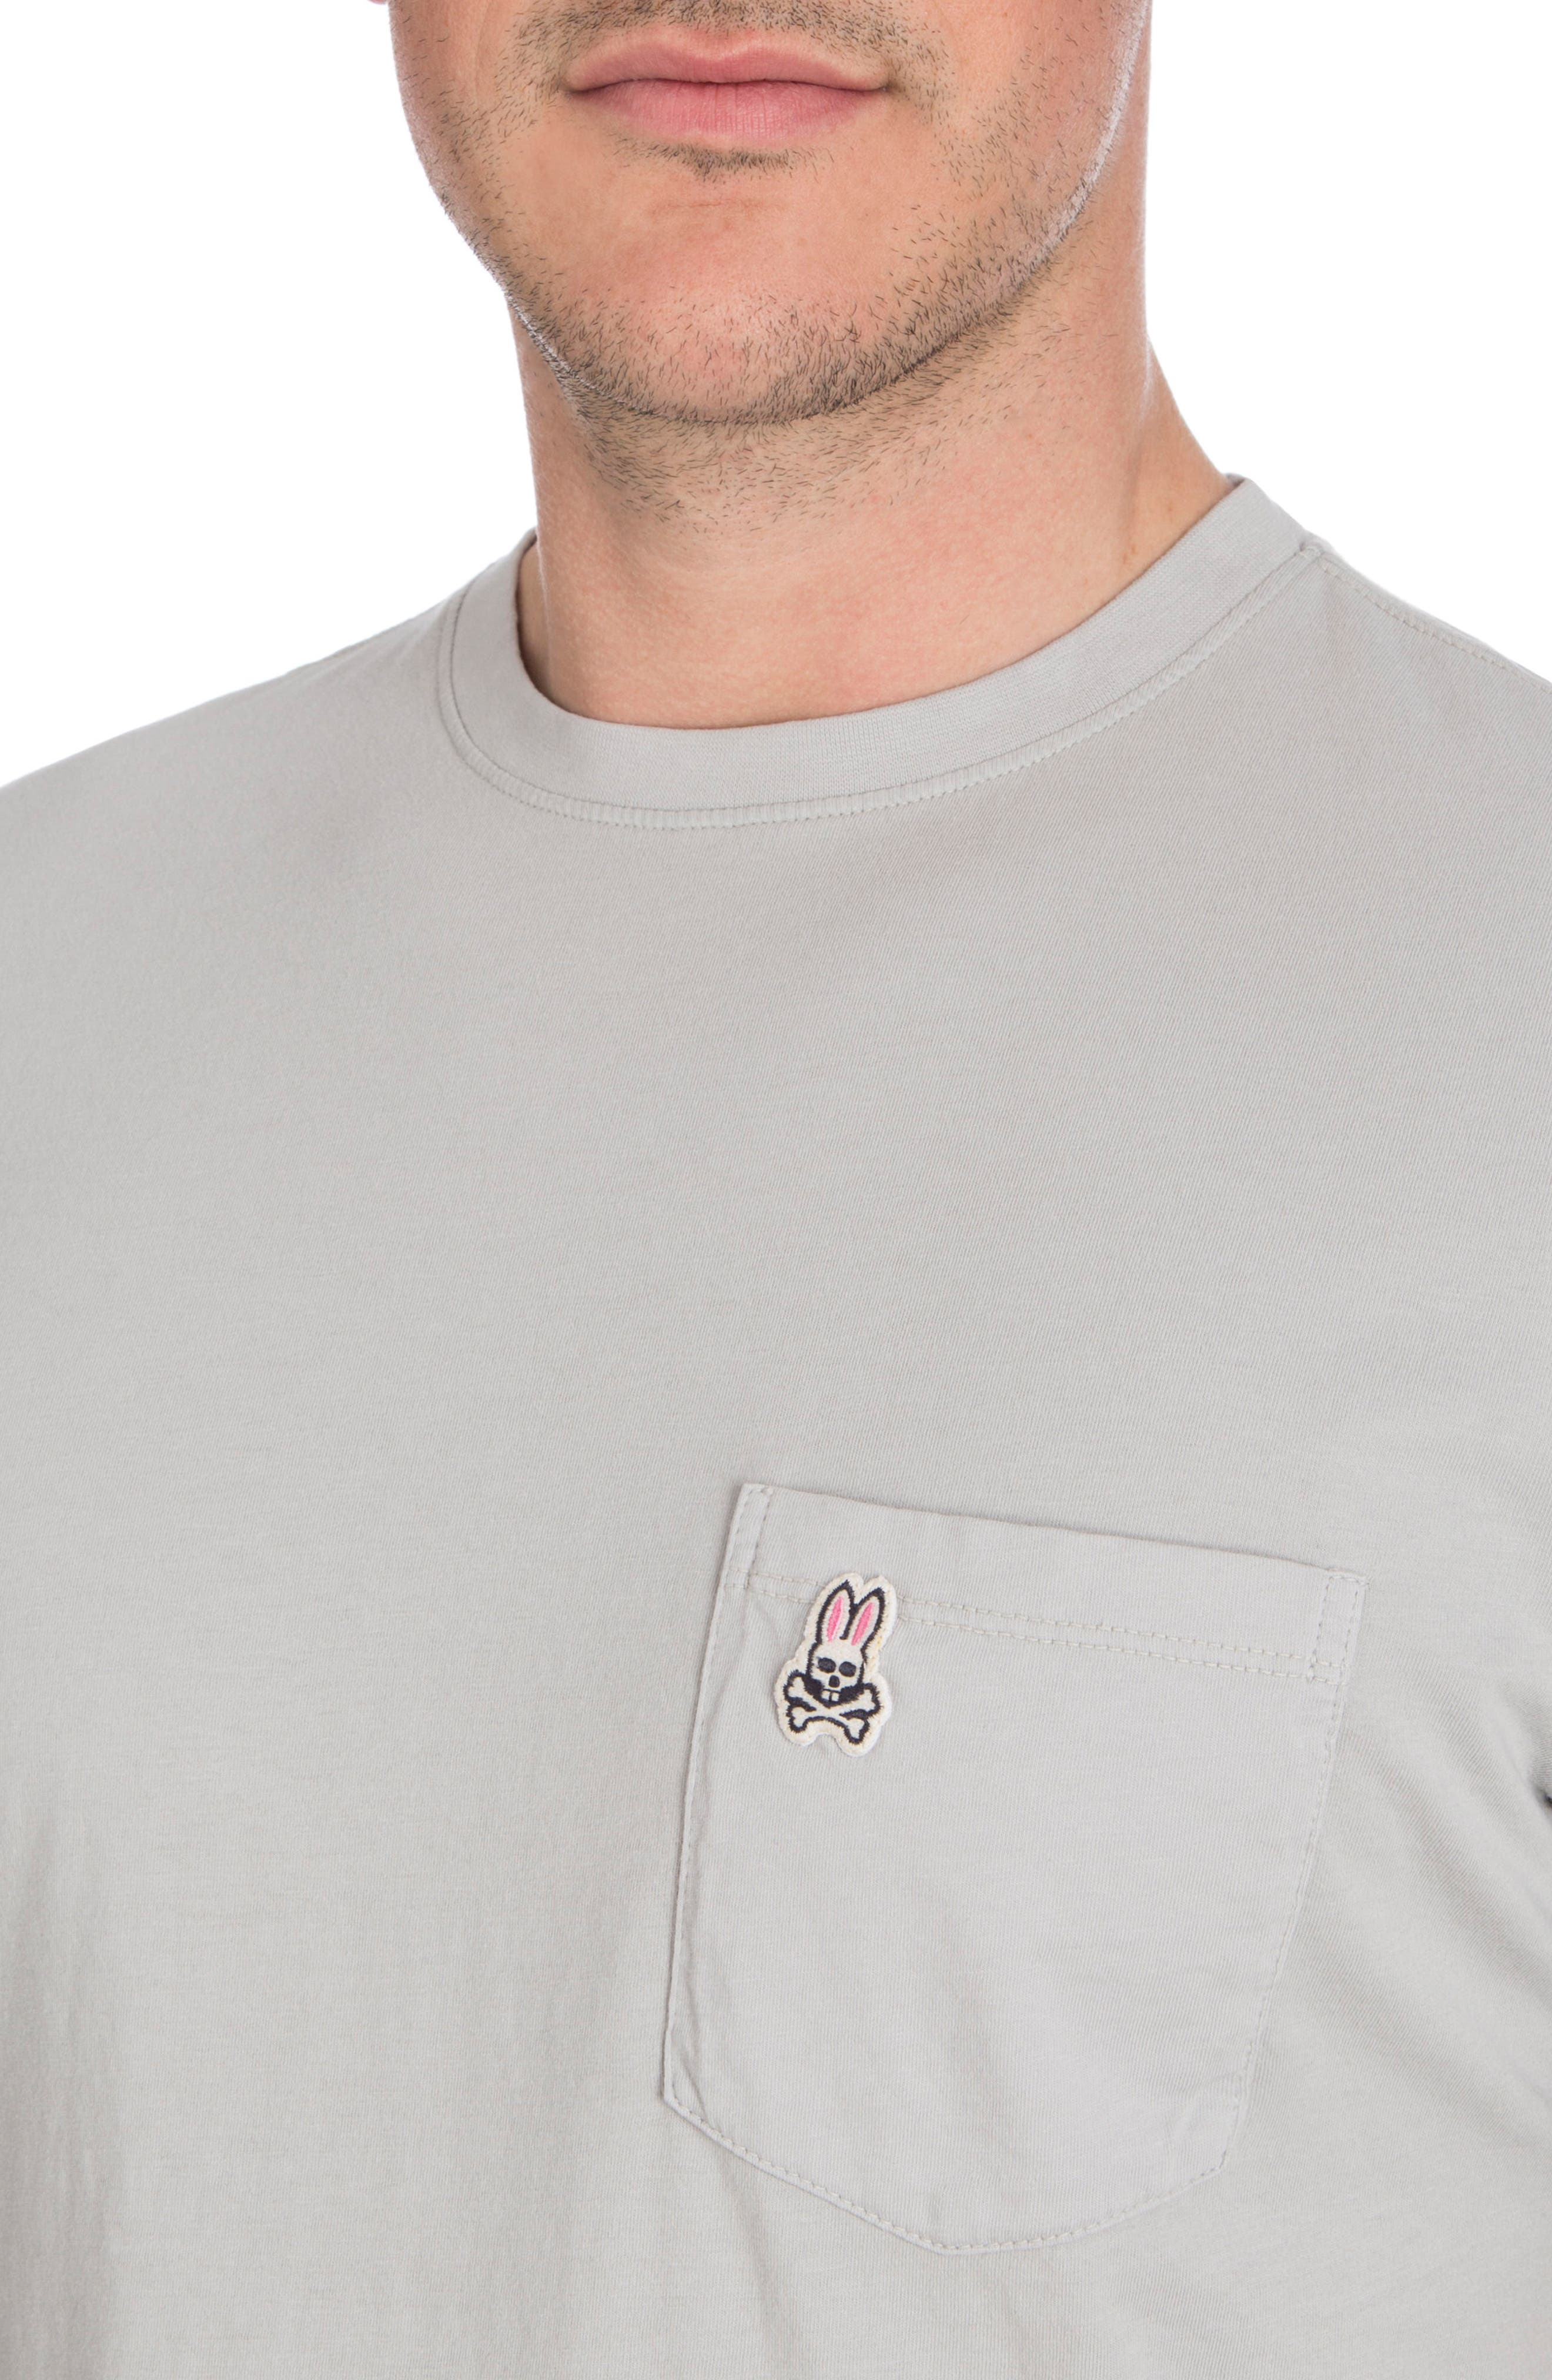 Langford Garment Dye T-Shirt,                             Alternate thumbnail 2, color,                             Alloy